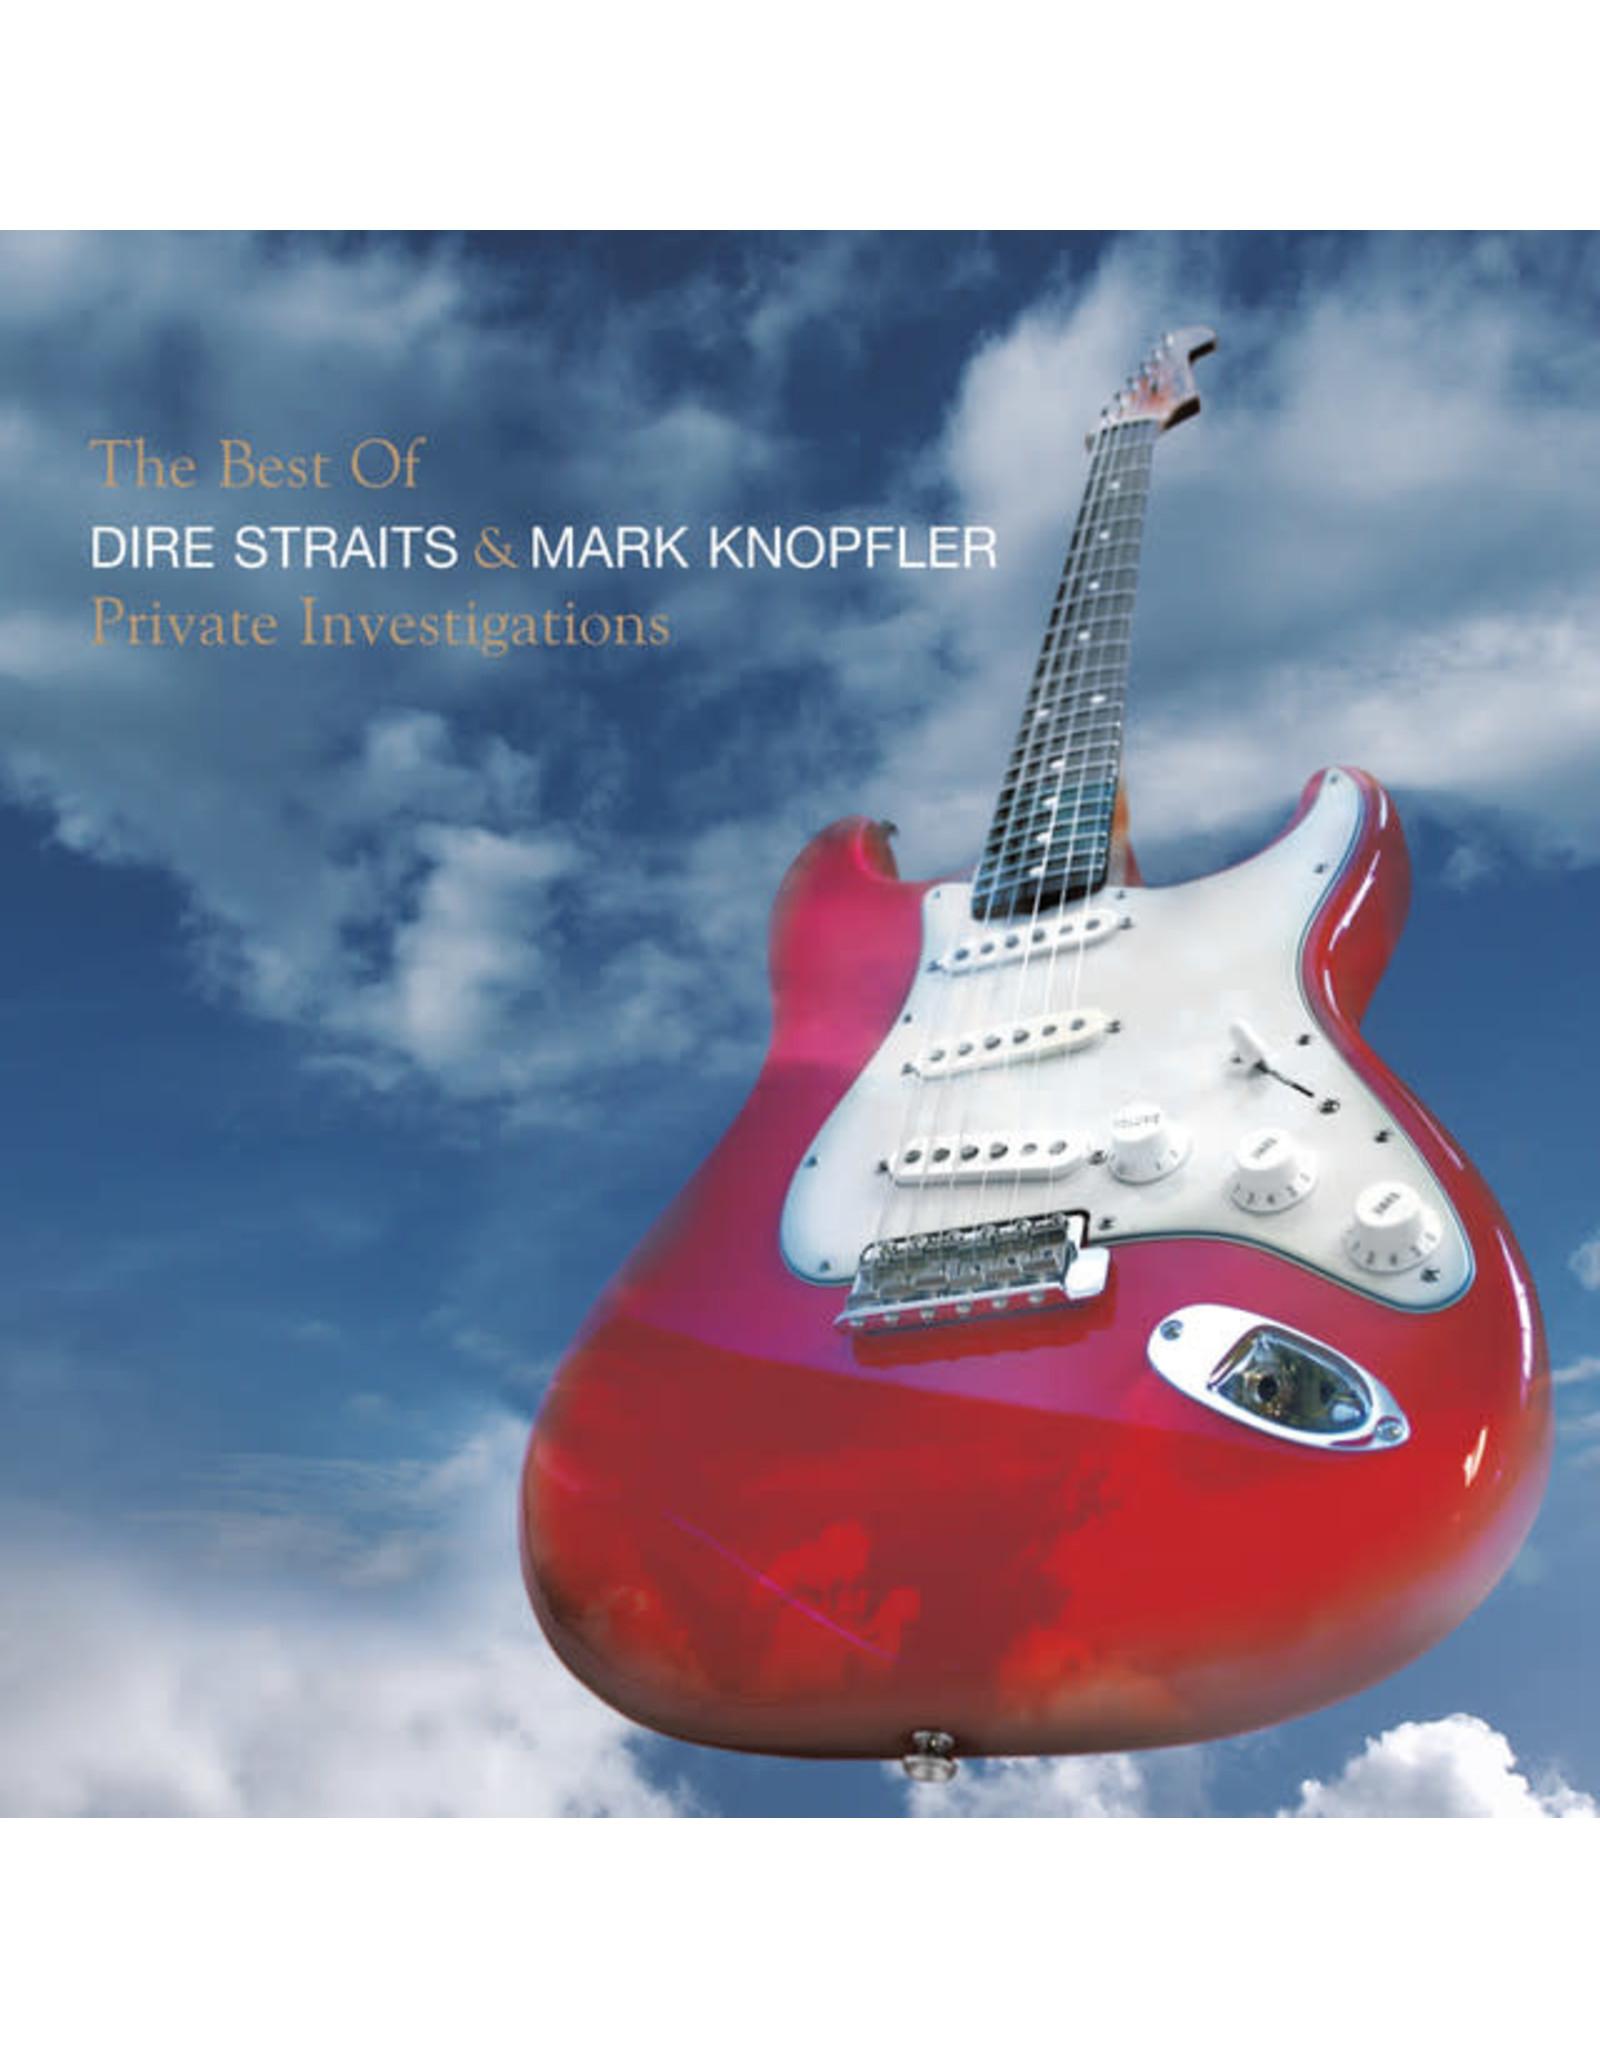 Vinyl Dire Straits - Best Of Dire Straits & Mark Knopfler Private Investigations